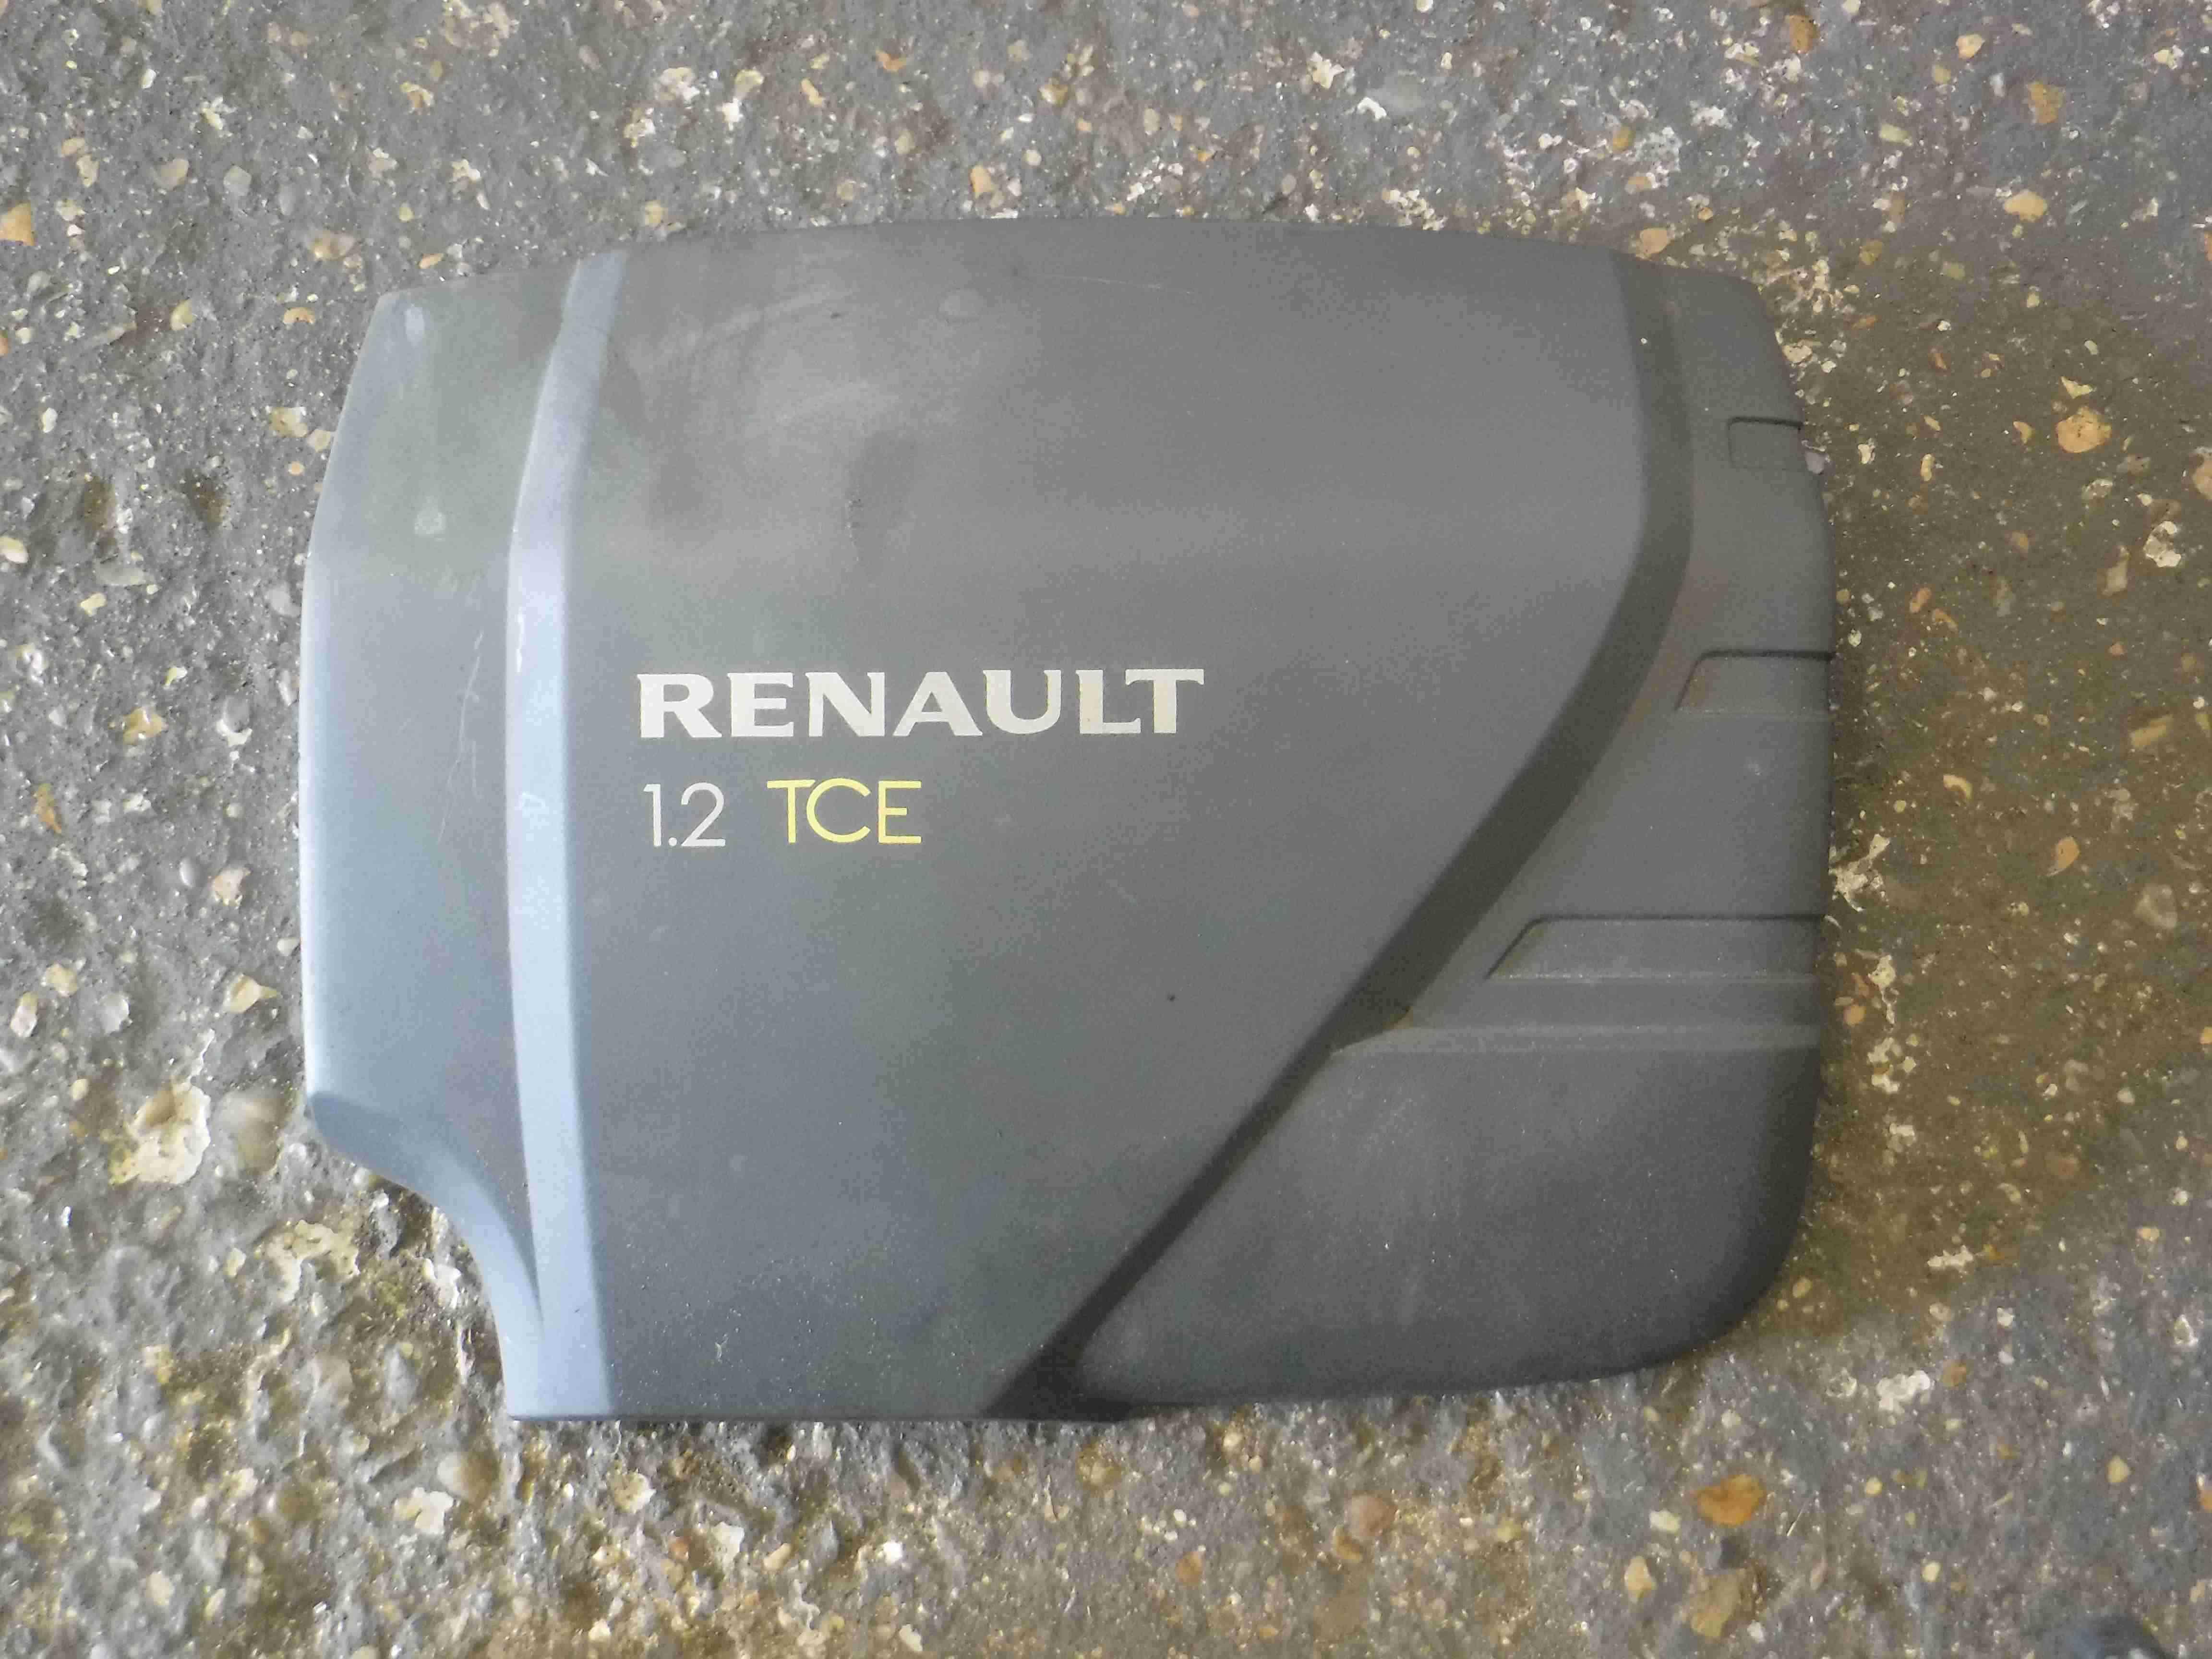 Renault Clio MK3 2005-2012 1.2 Turbo tCe Engine Cover Plastic 8200587307